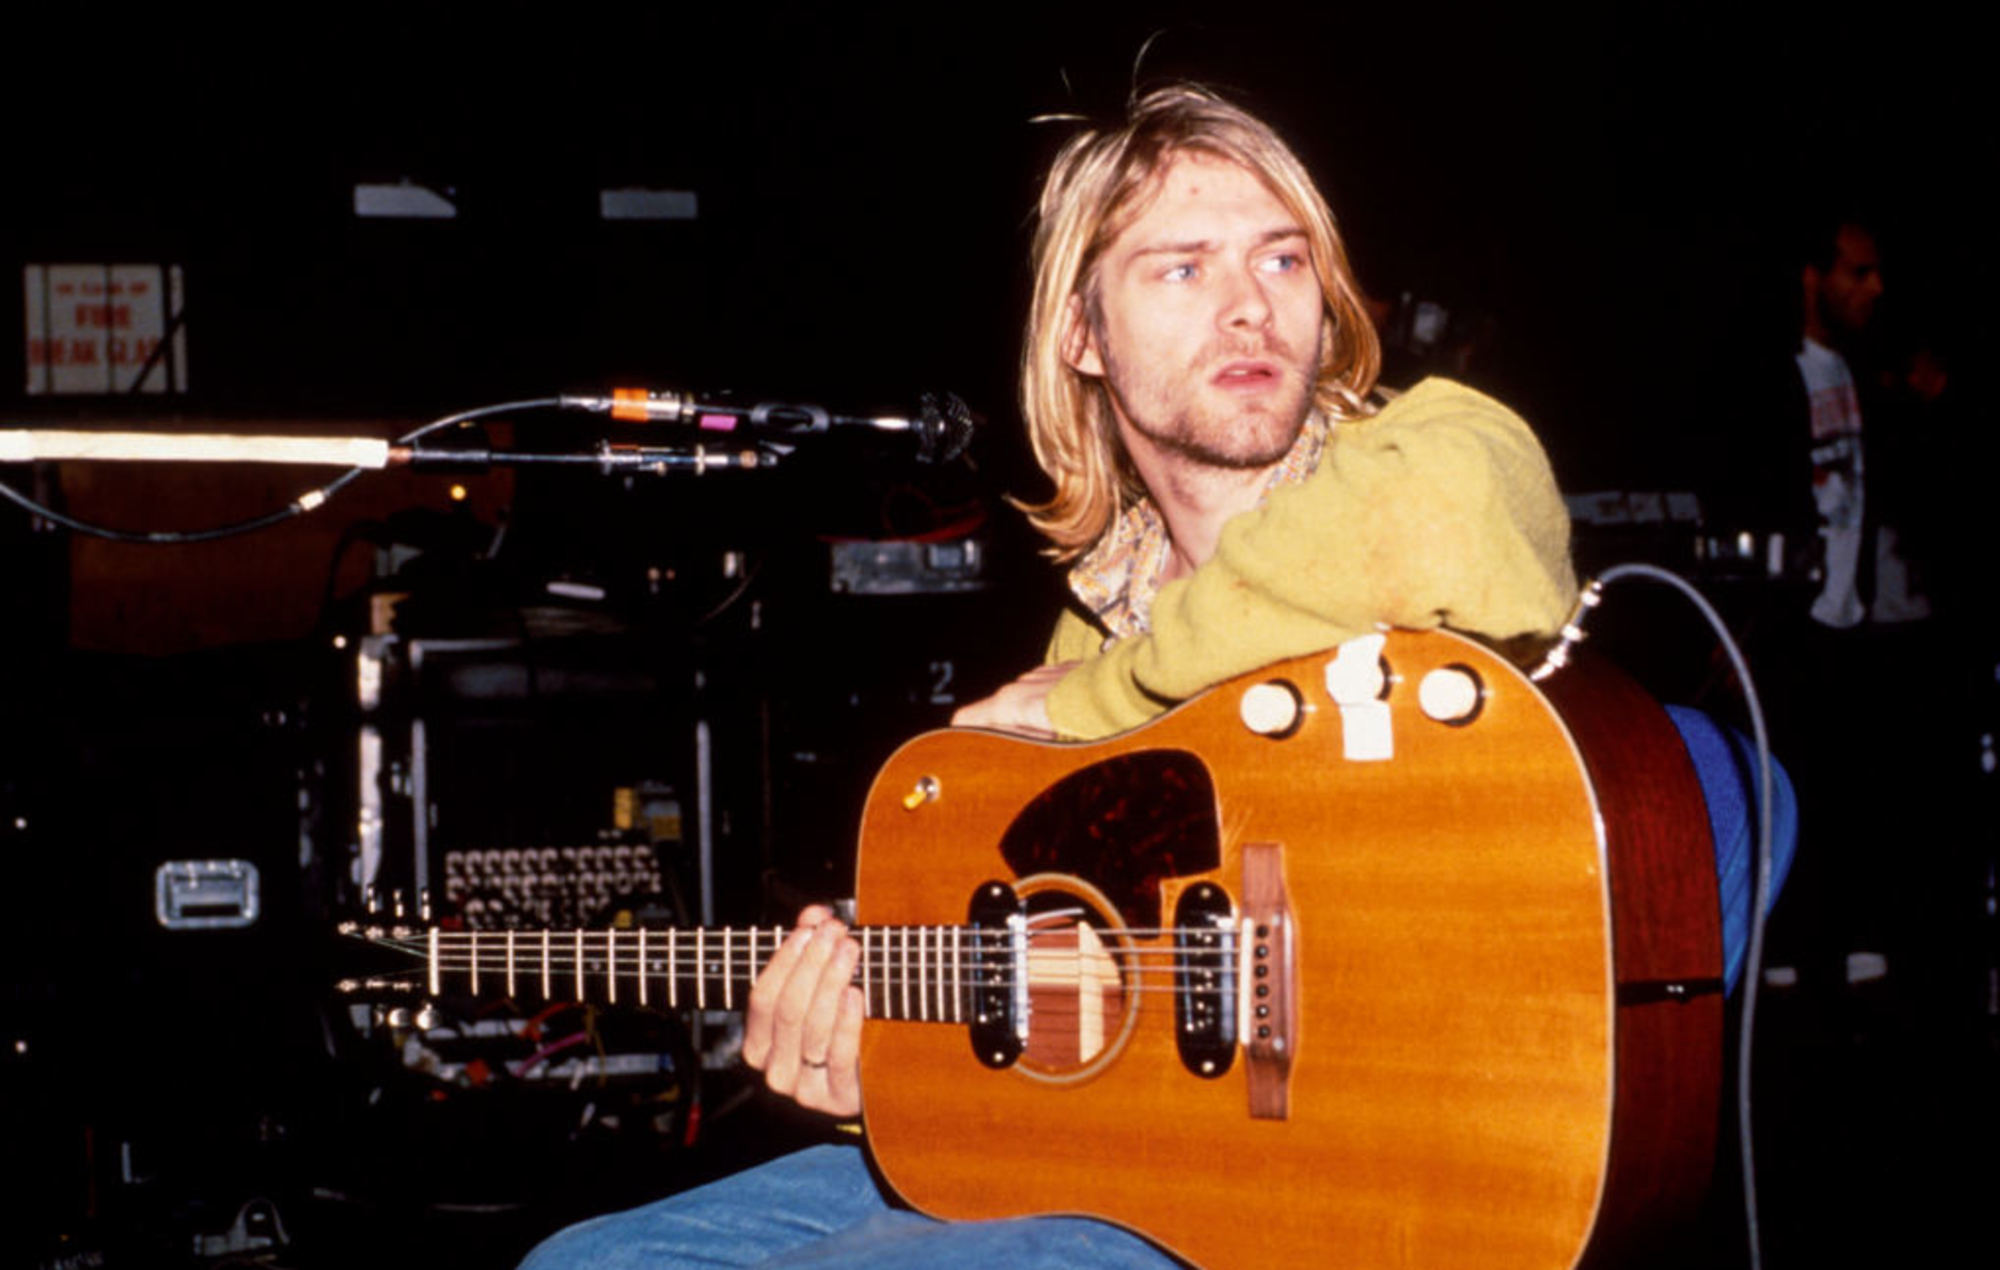 Nirvana's 'Smells Like Teen Spirit' reaches one billion views on YouTube - EpicNews